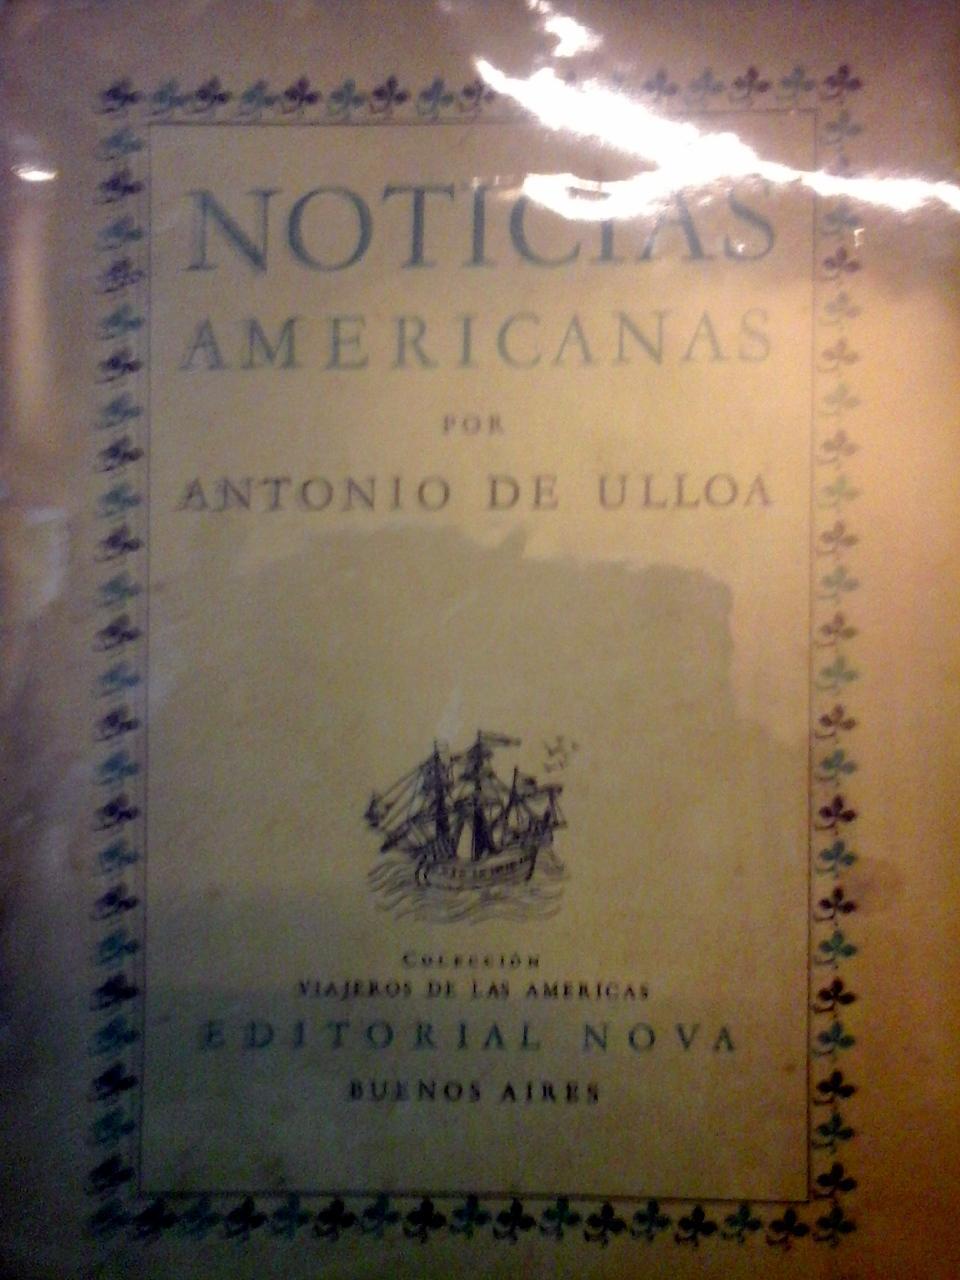 Antonio de ulloa first edition abebooks fandeluxe Images